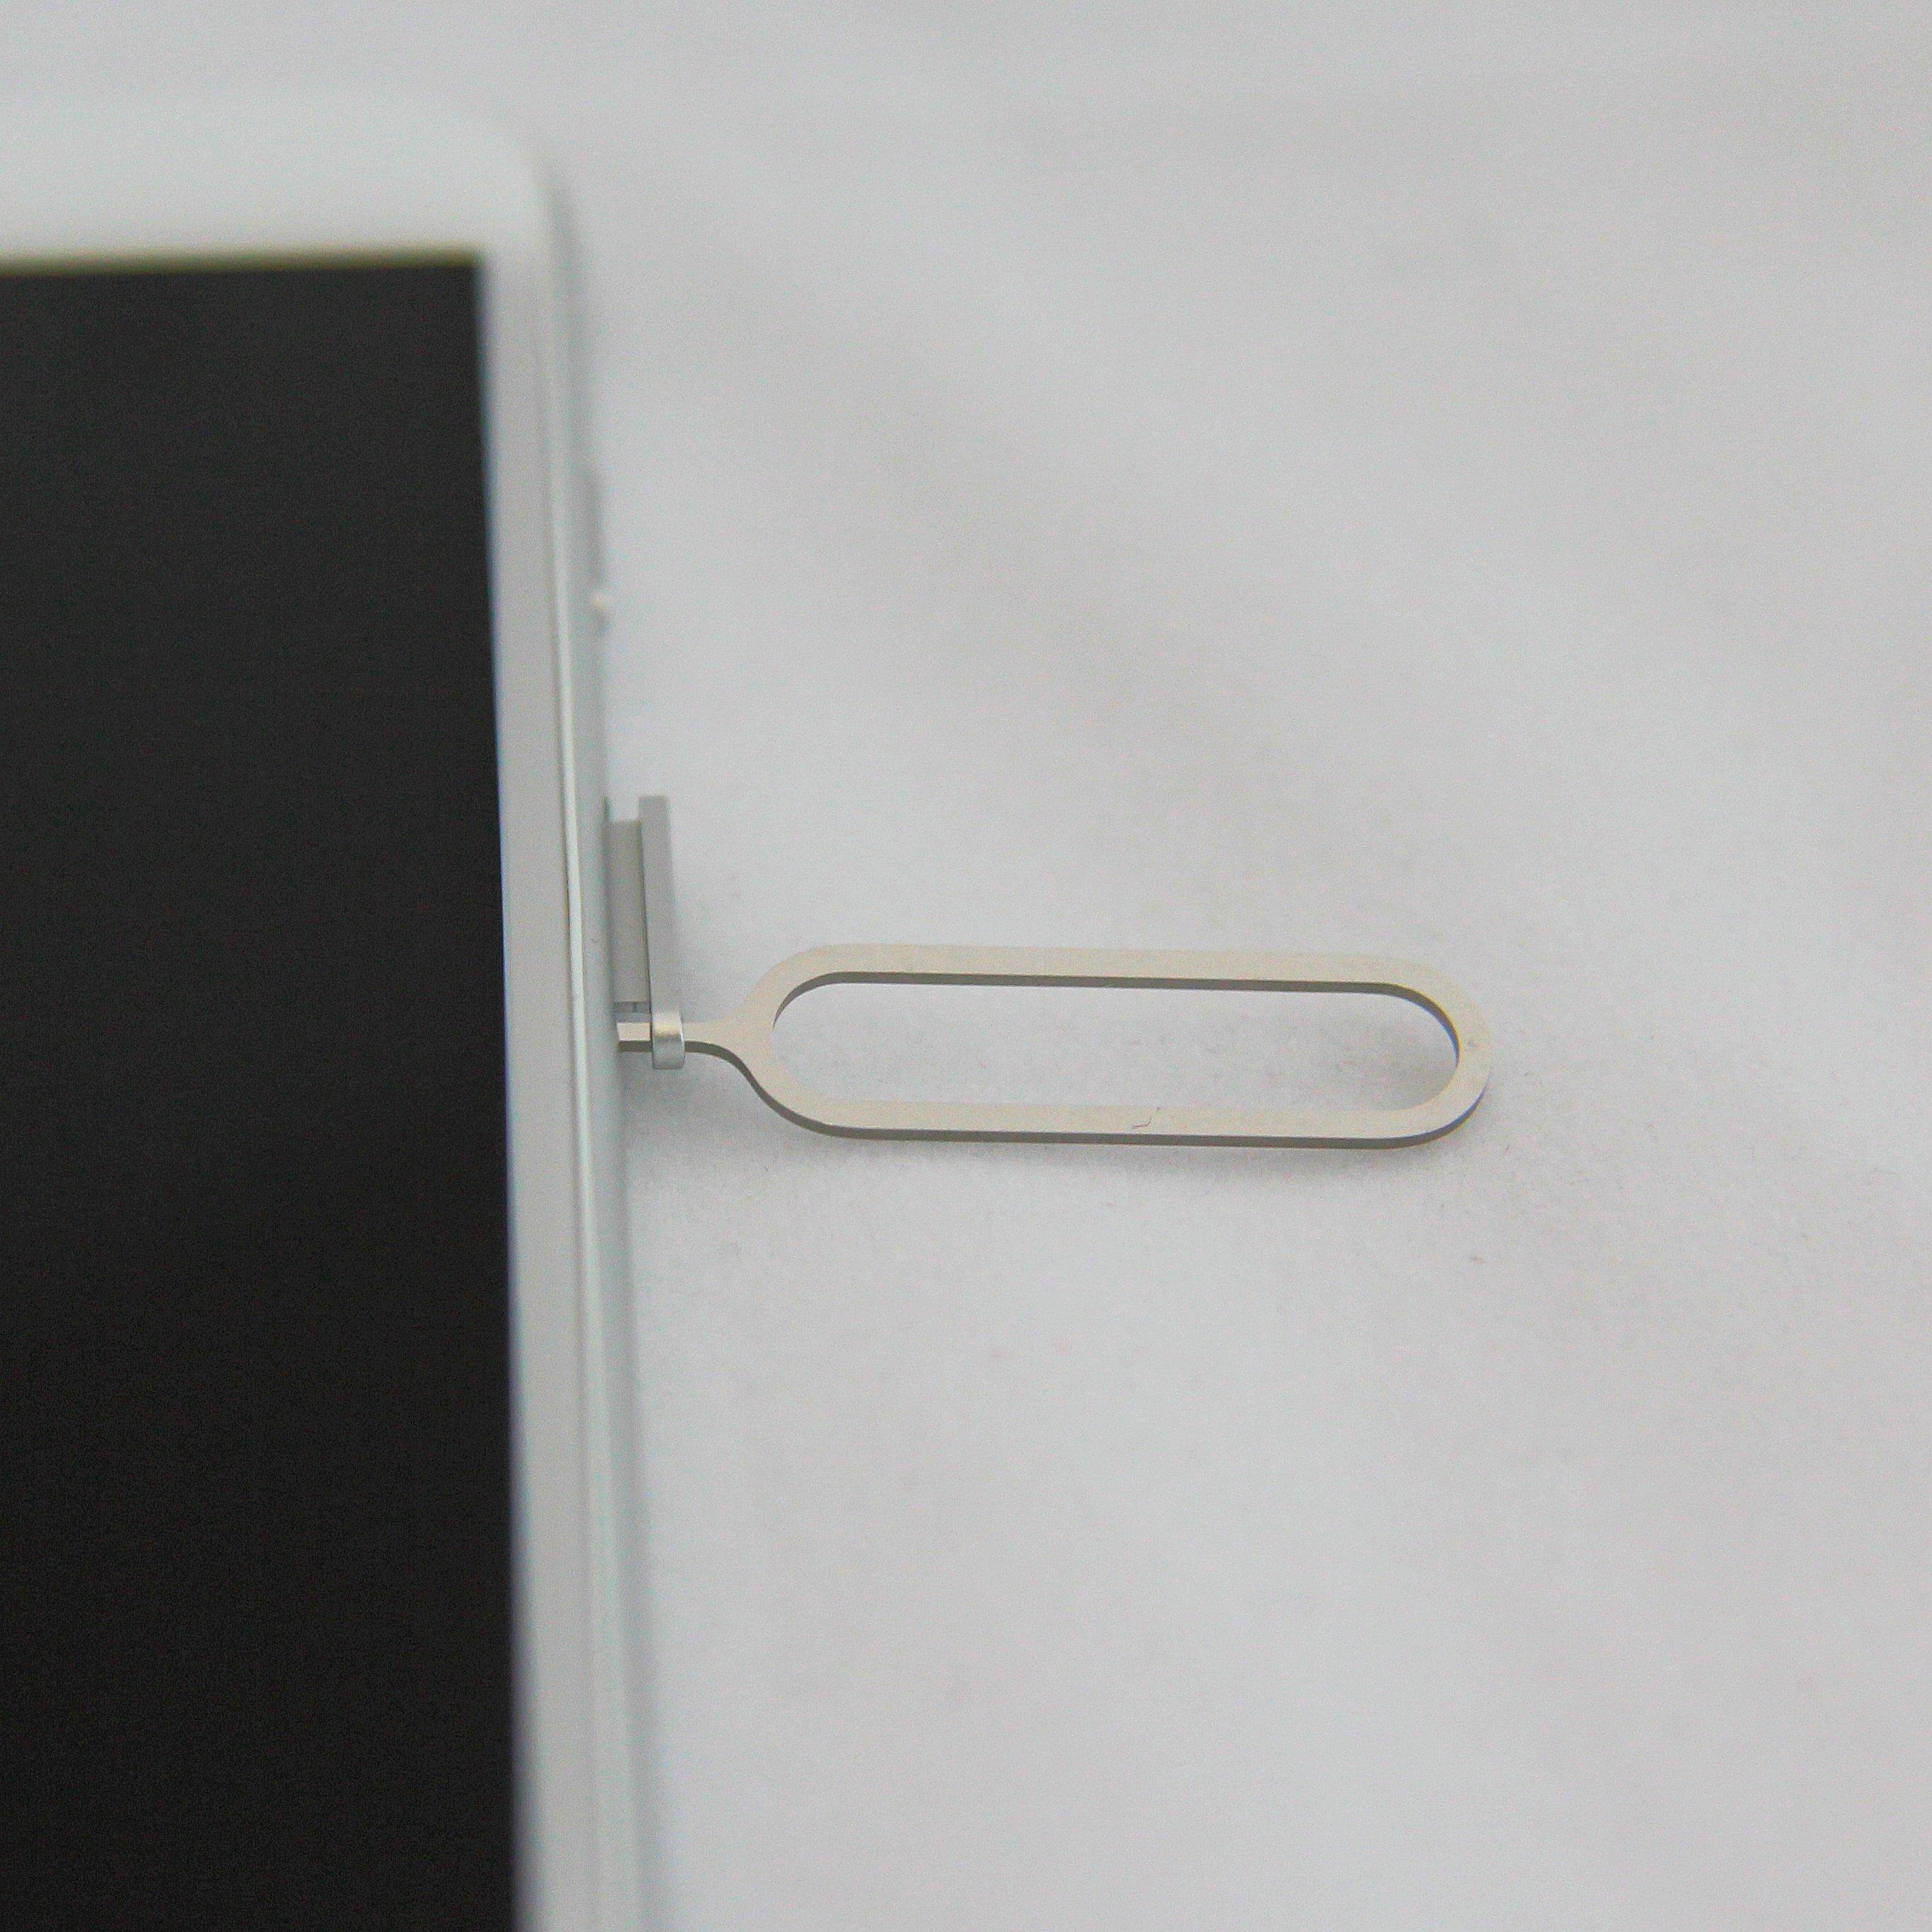 welche sim karte iphone 6 iPhone6 iPhone 6 Anleitung SIM Karte einlegen Nano Mini Micro